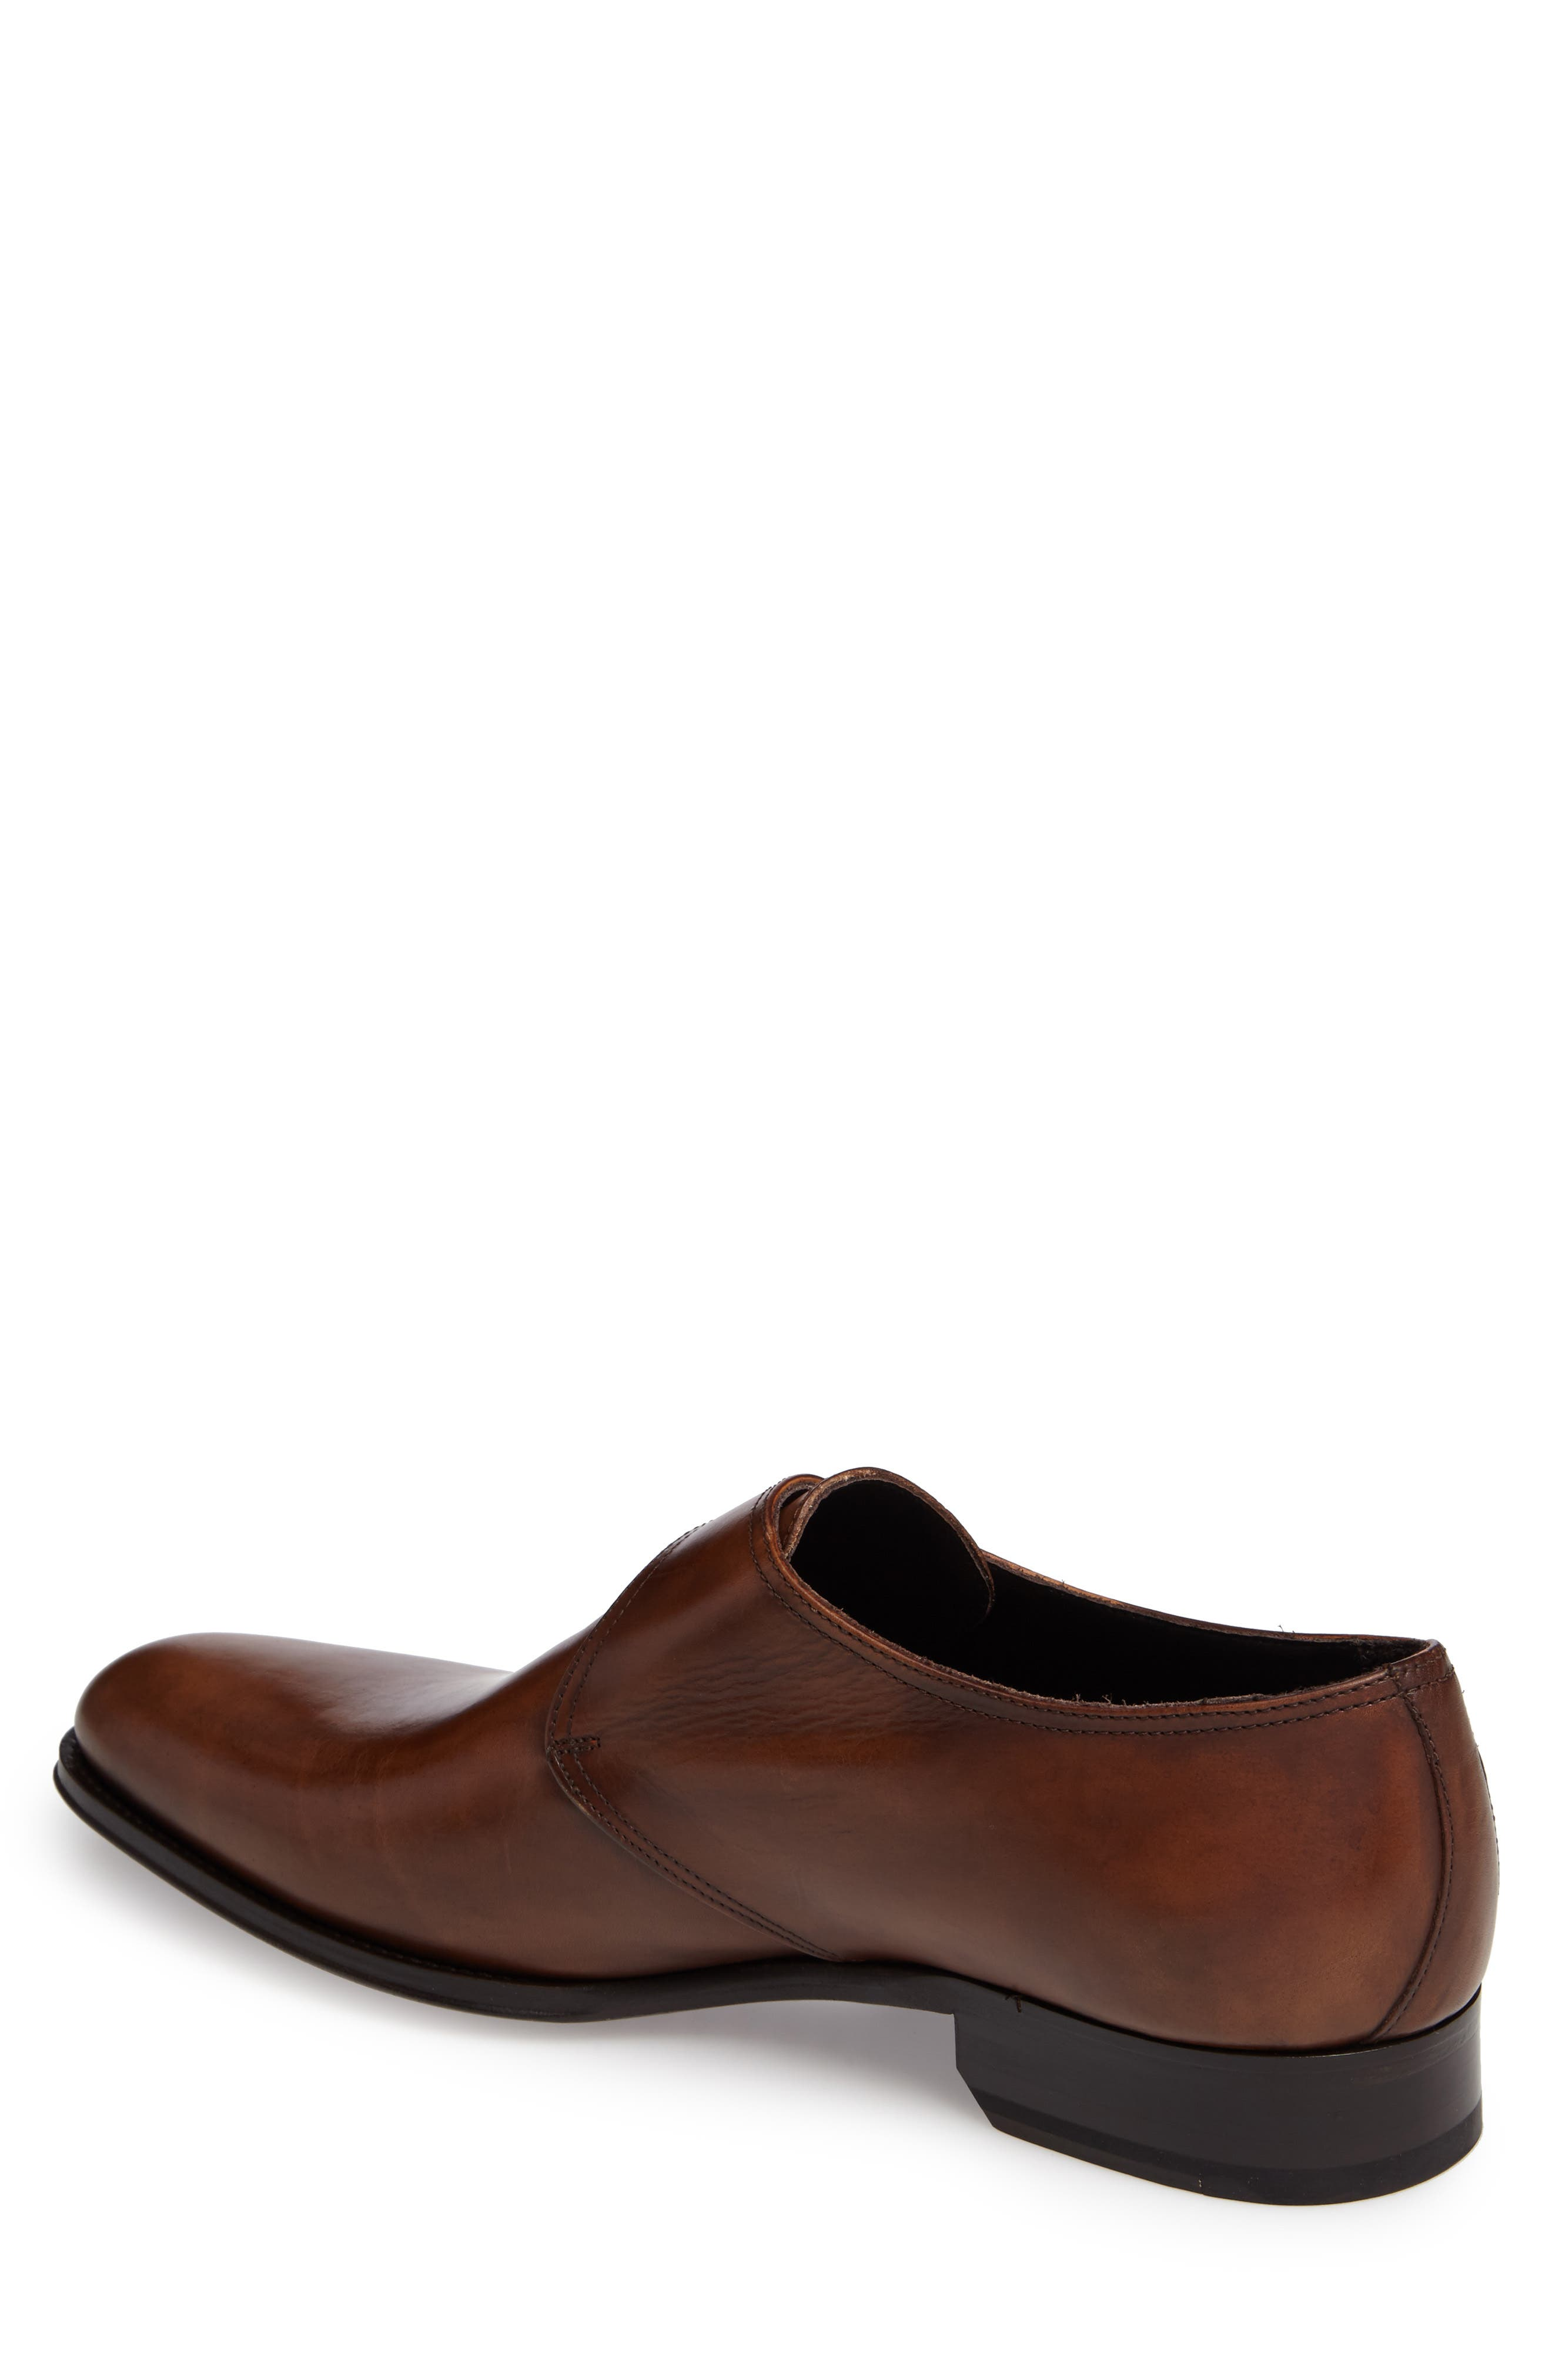 Emmett Monk Strap Shoe,                             Alternate thumbnail 8, color,